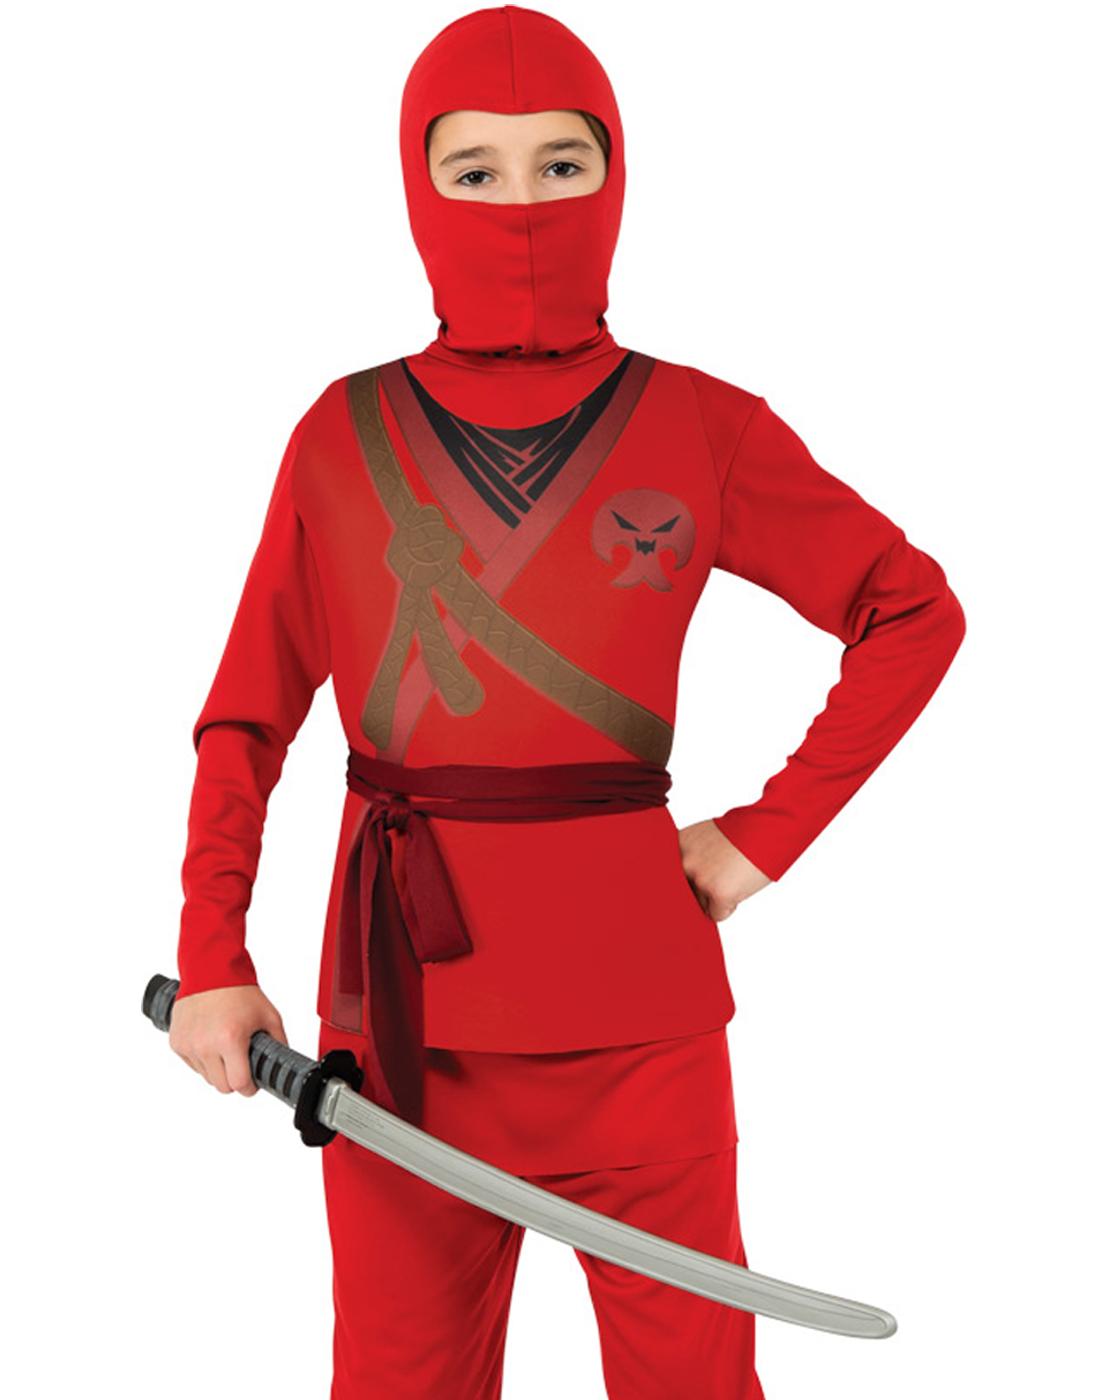 Karate Kid Halloween Costume.Details About Ninja Boy Karate Kid Red Hooded Scarf Halloween Child Fancy Dress Up Costume